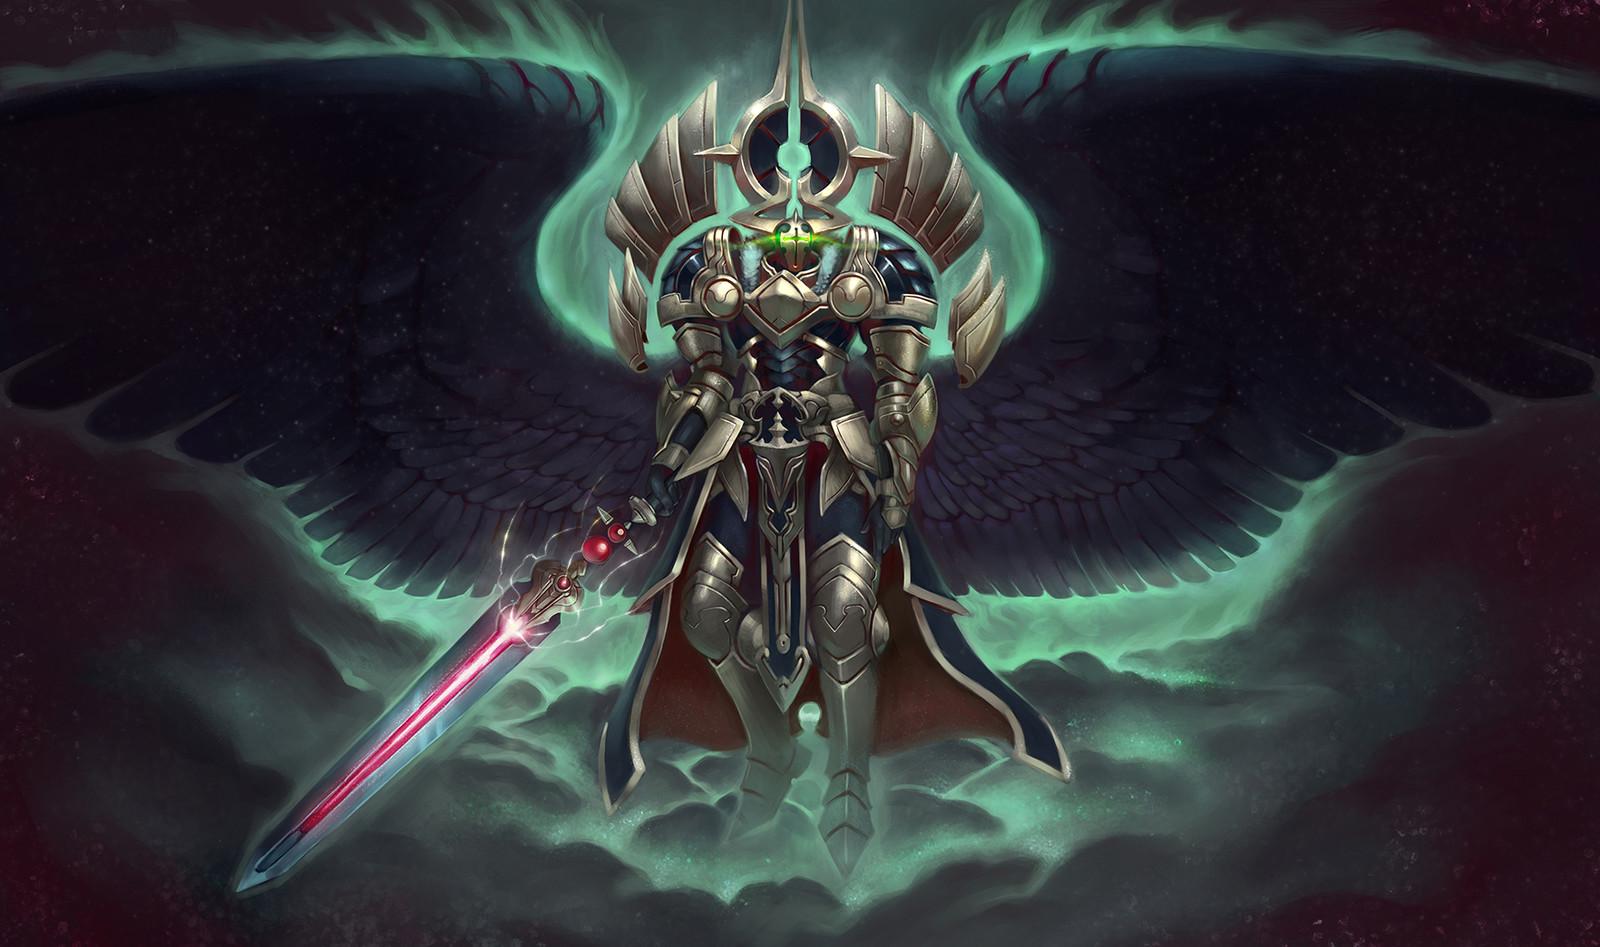 Xeroth, the Warrior God